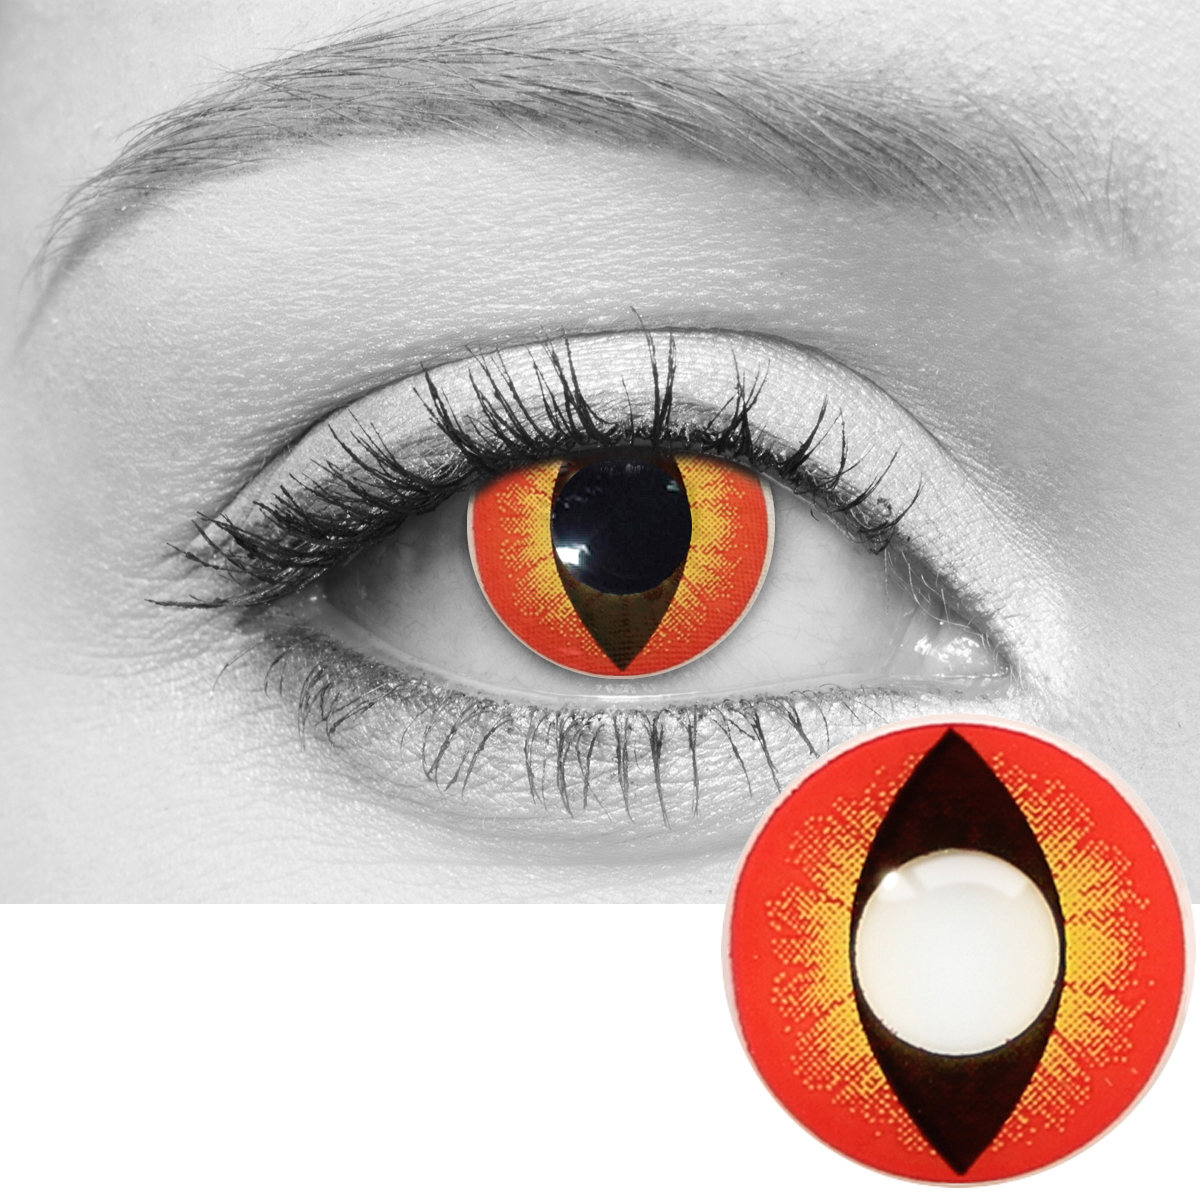 Banshee red yellow contacts closeup